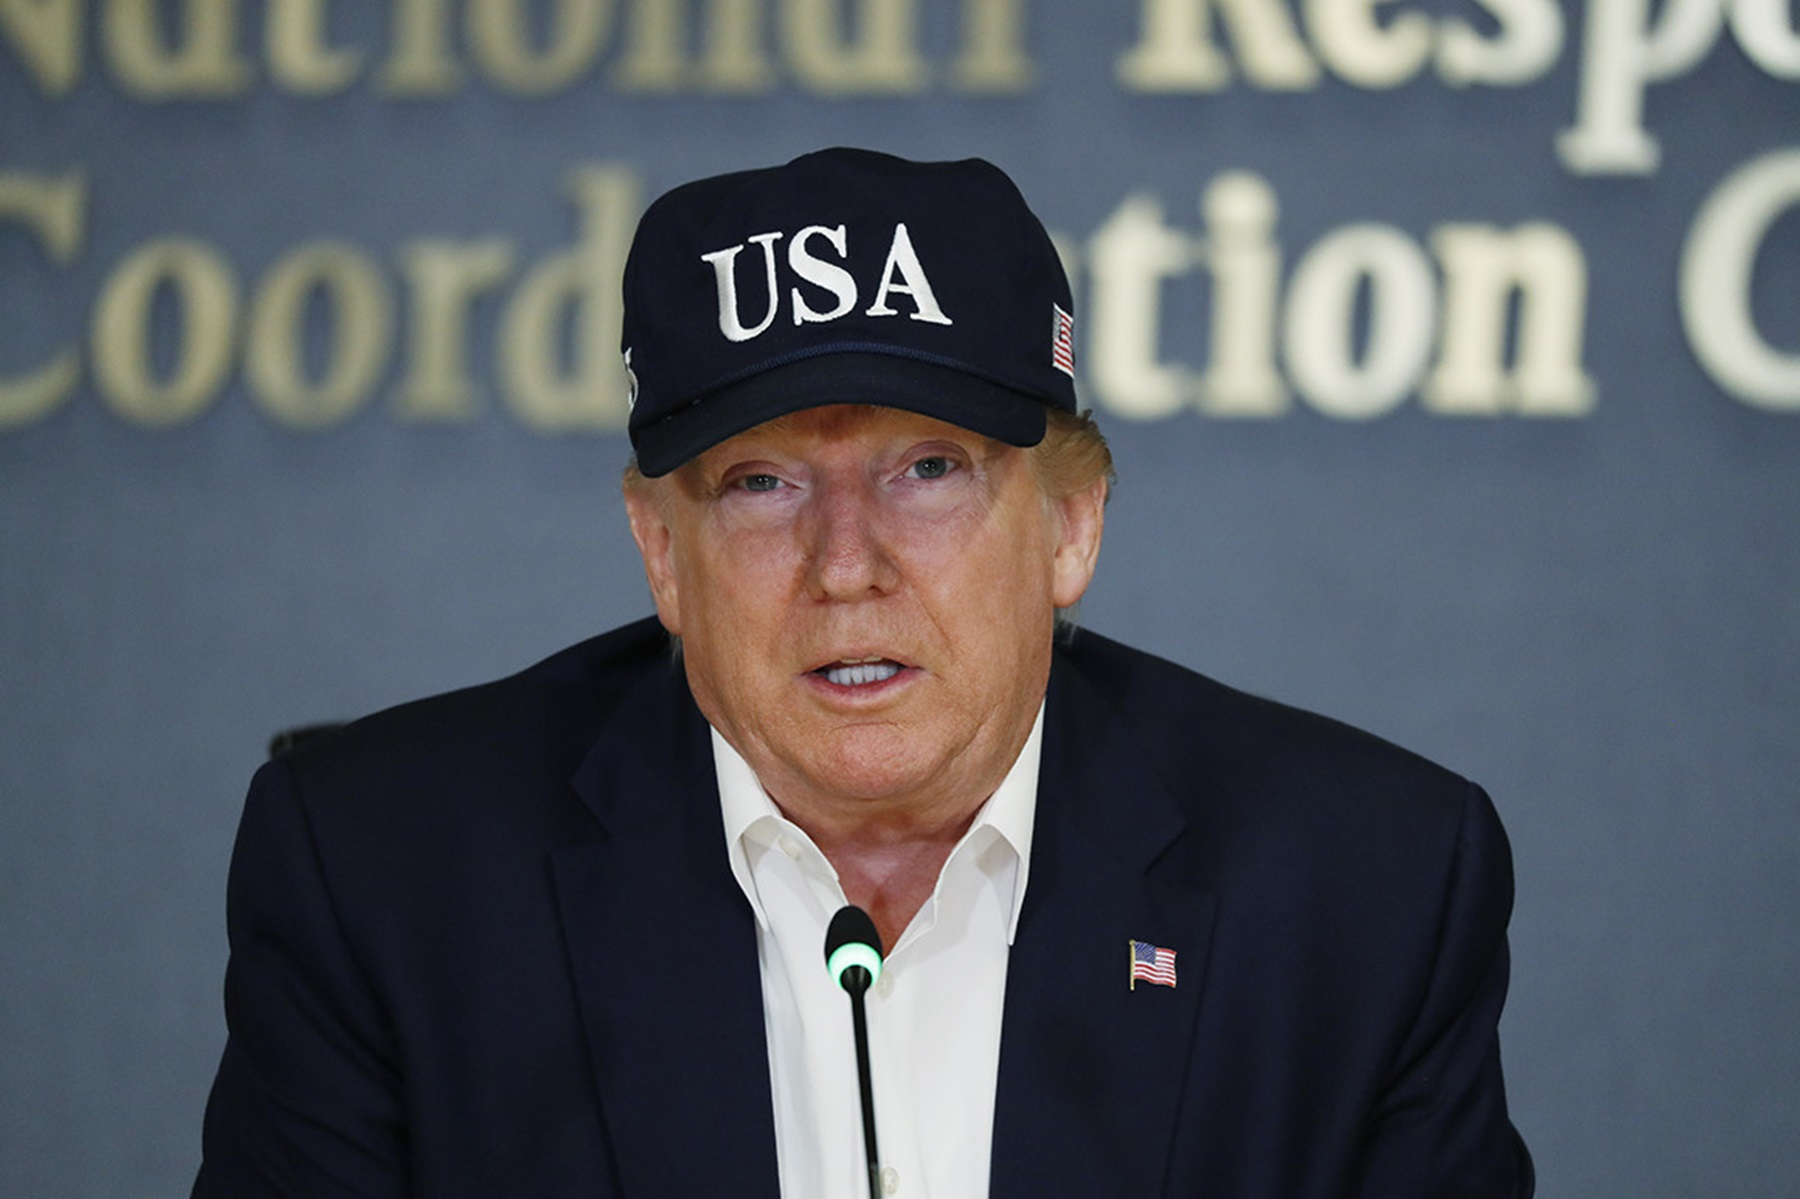 Donald Trump Labor Day Tweets